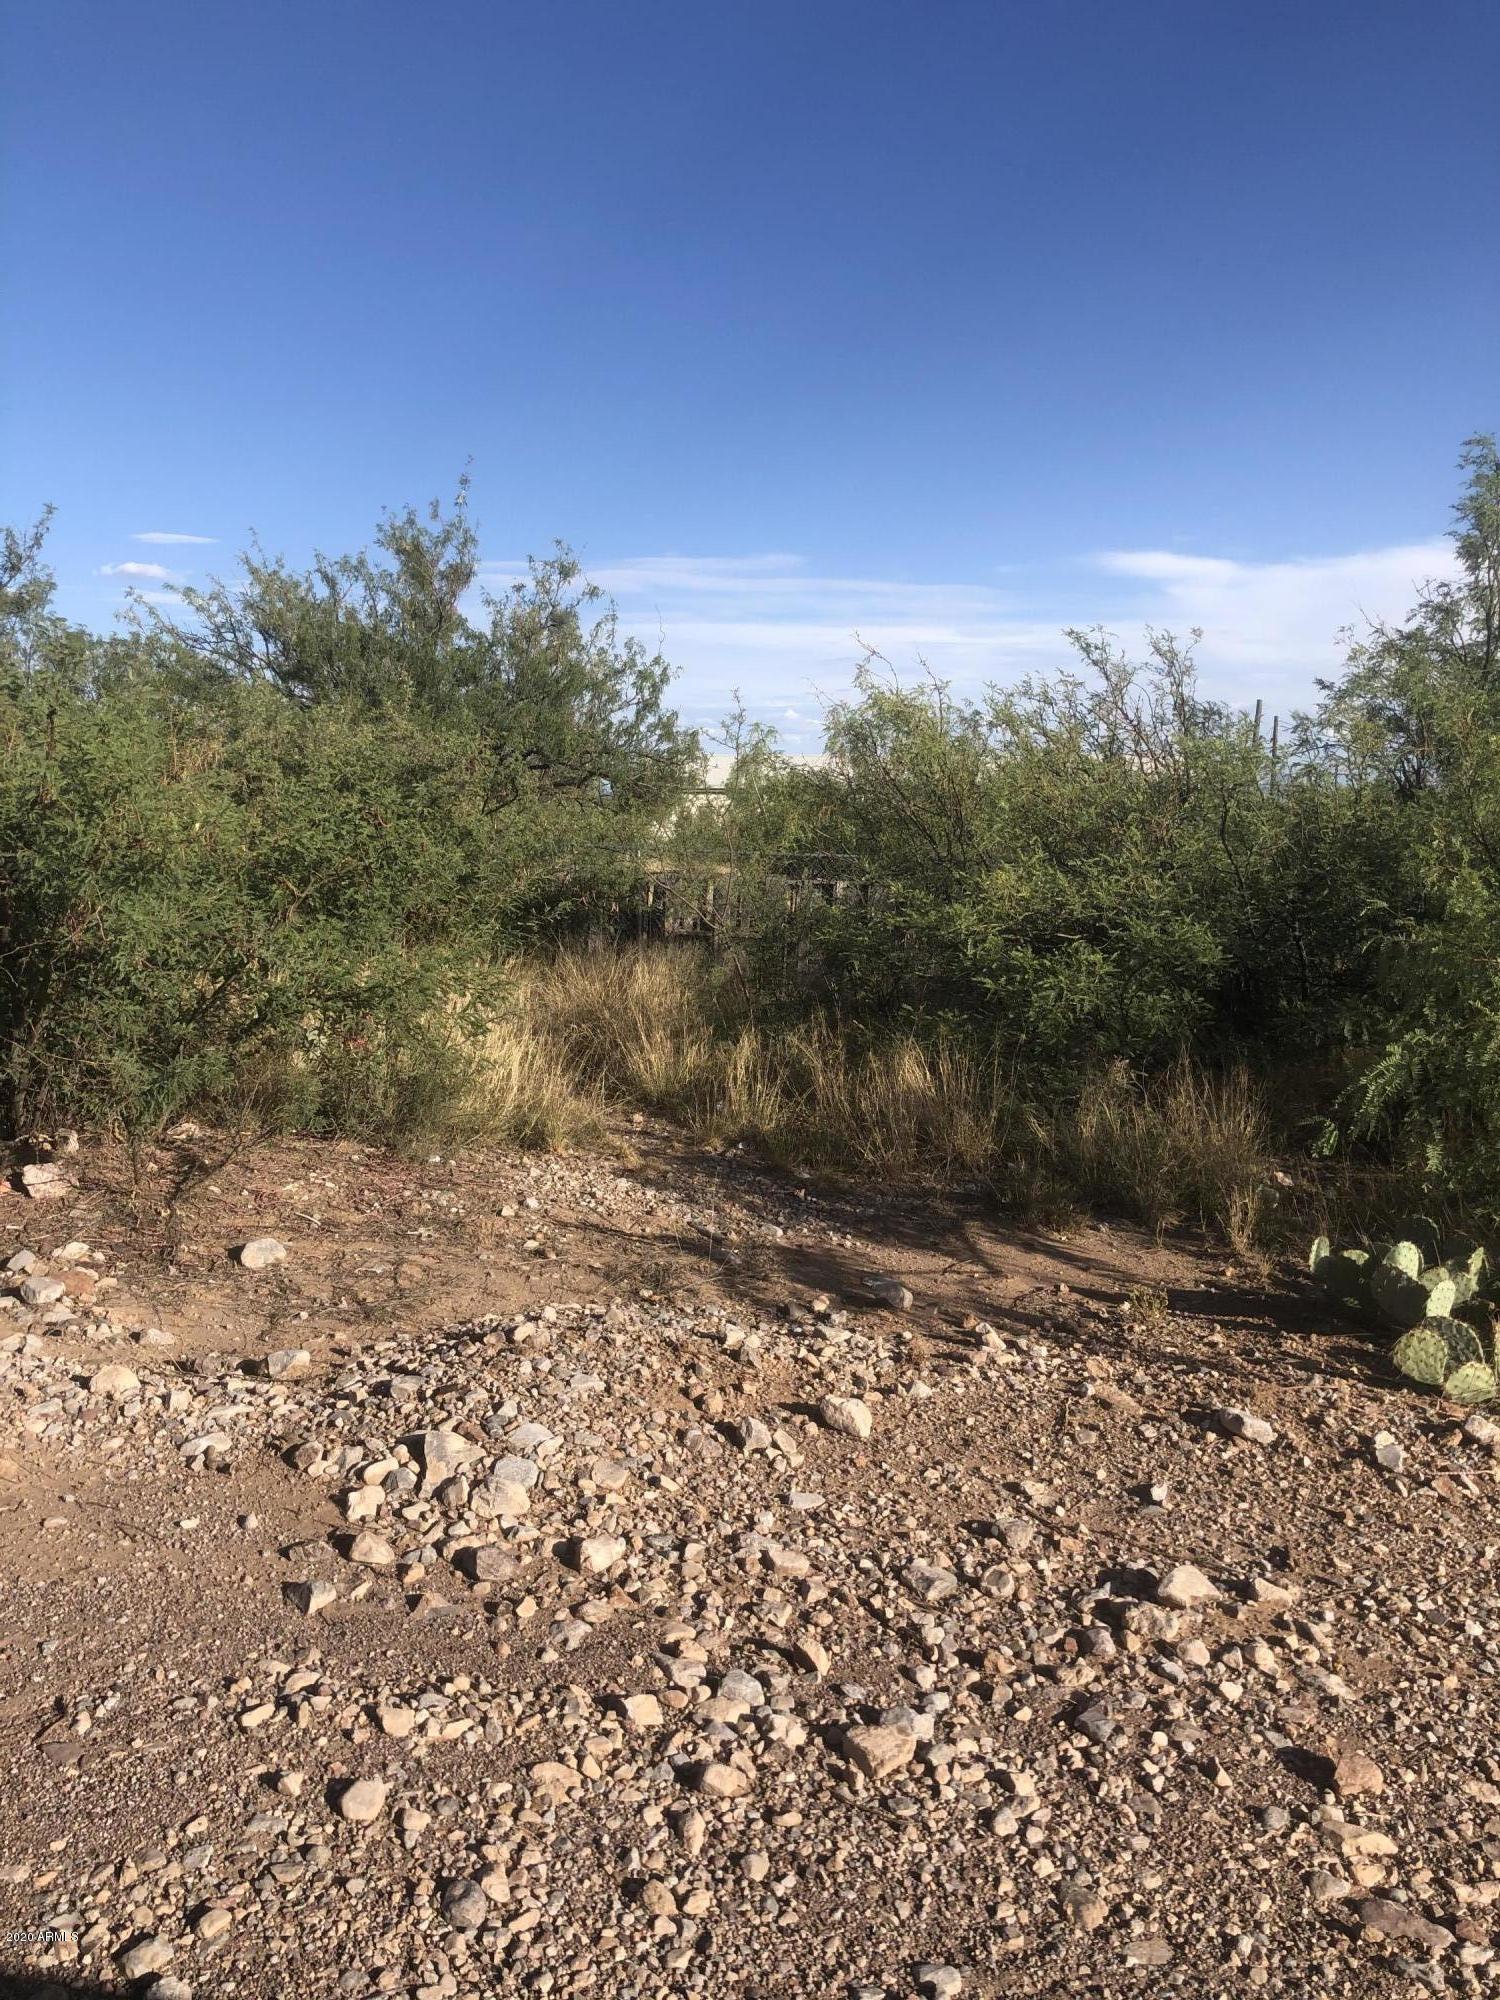 0 0 Road, Bisbee, Arizona 85603, ,Lots And Land,For Sale,0 0 Road,6106377